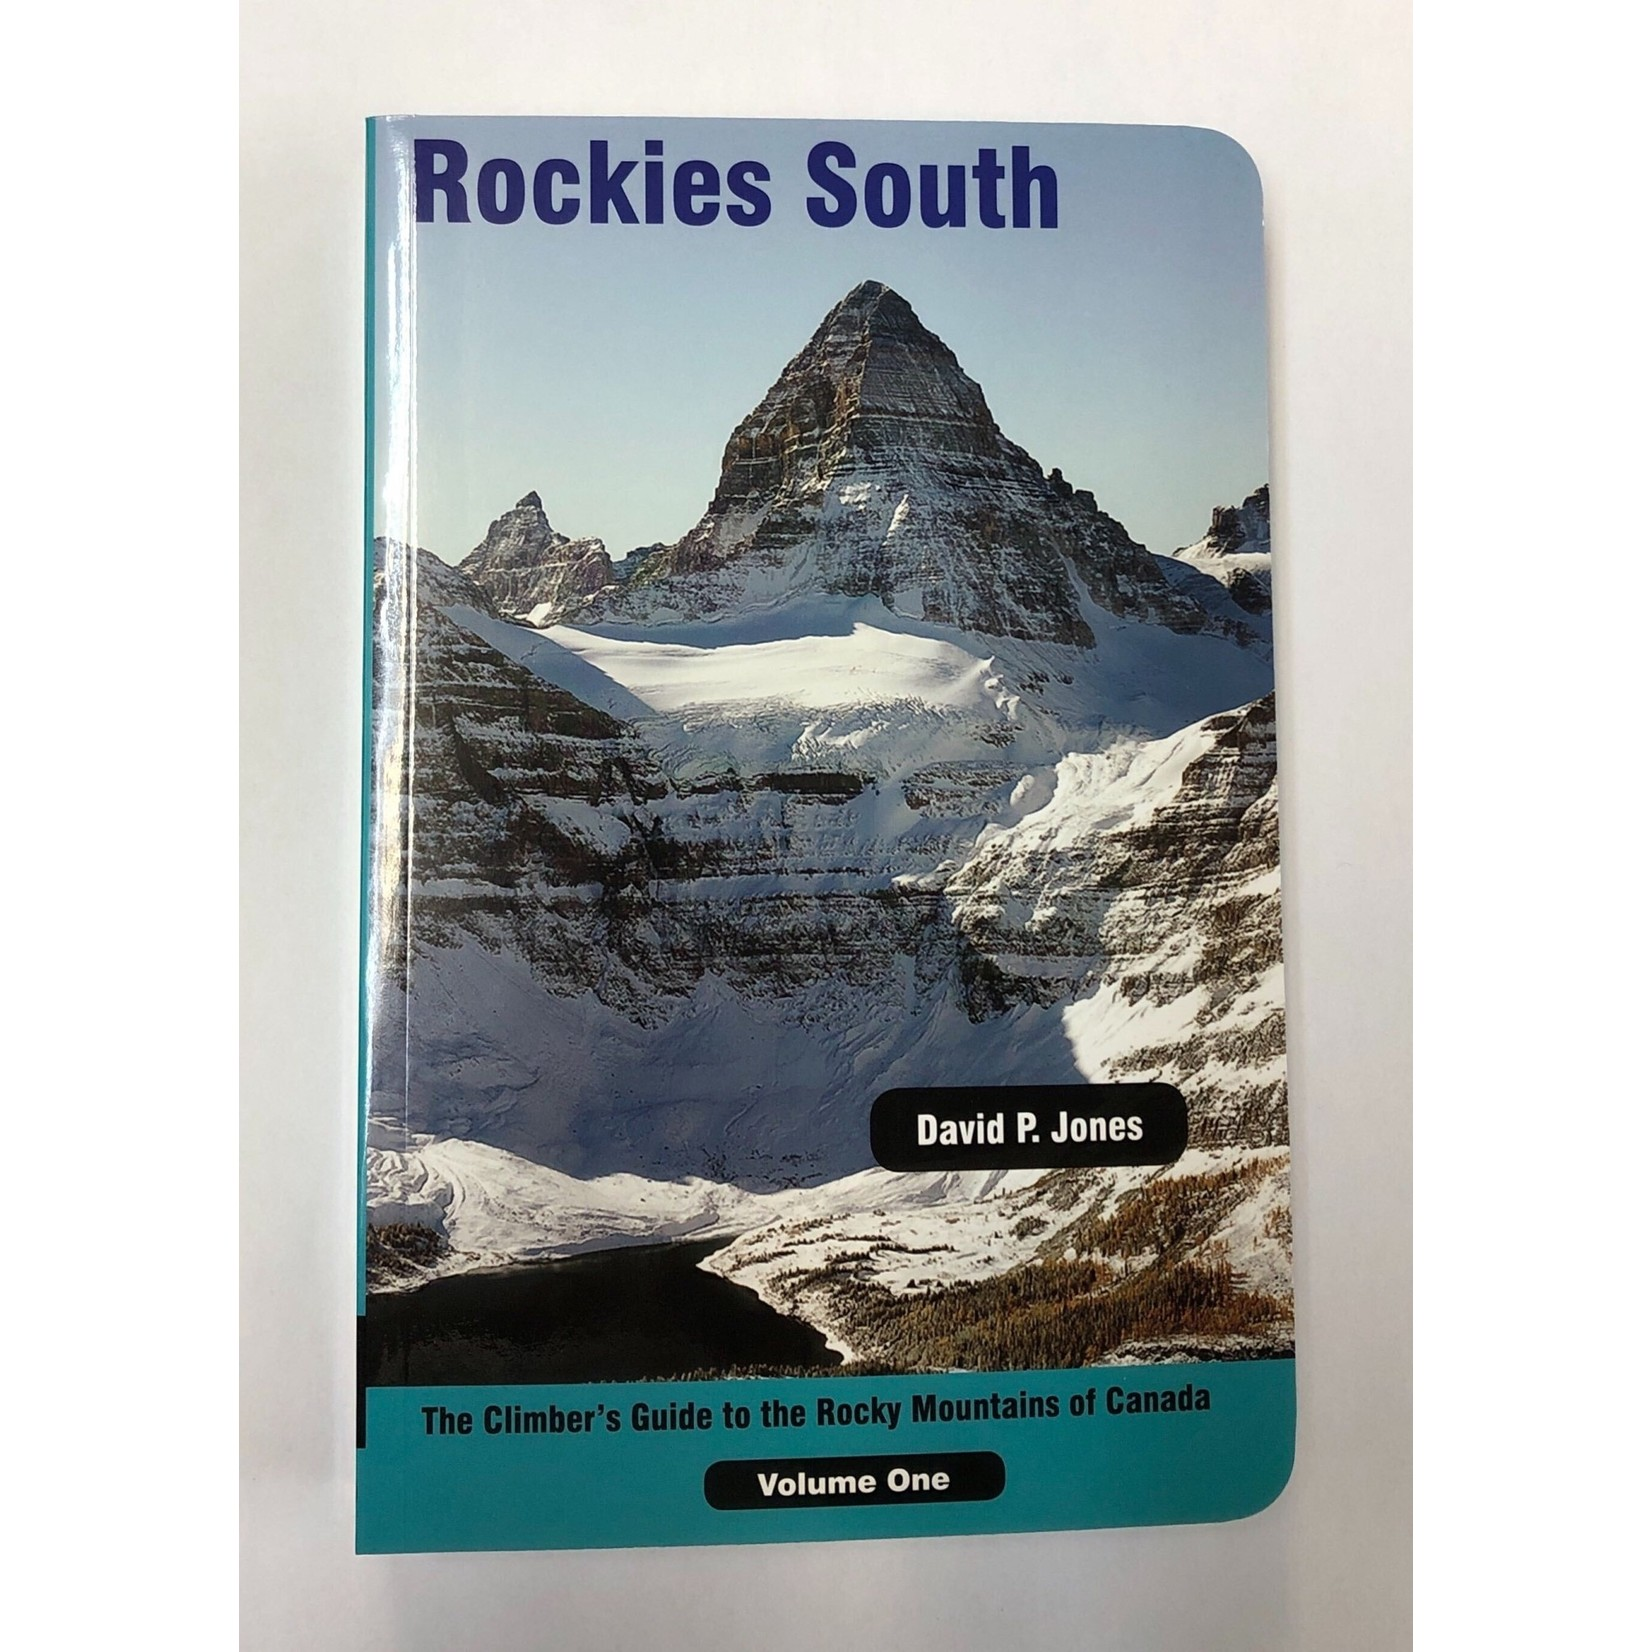 Rockies South Climbing Guide - Volume 1